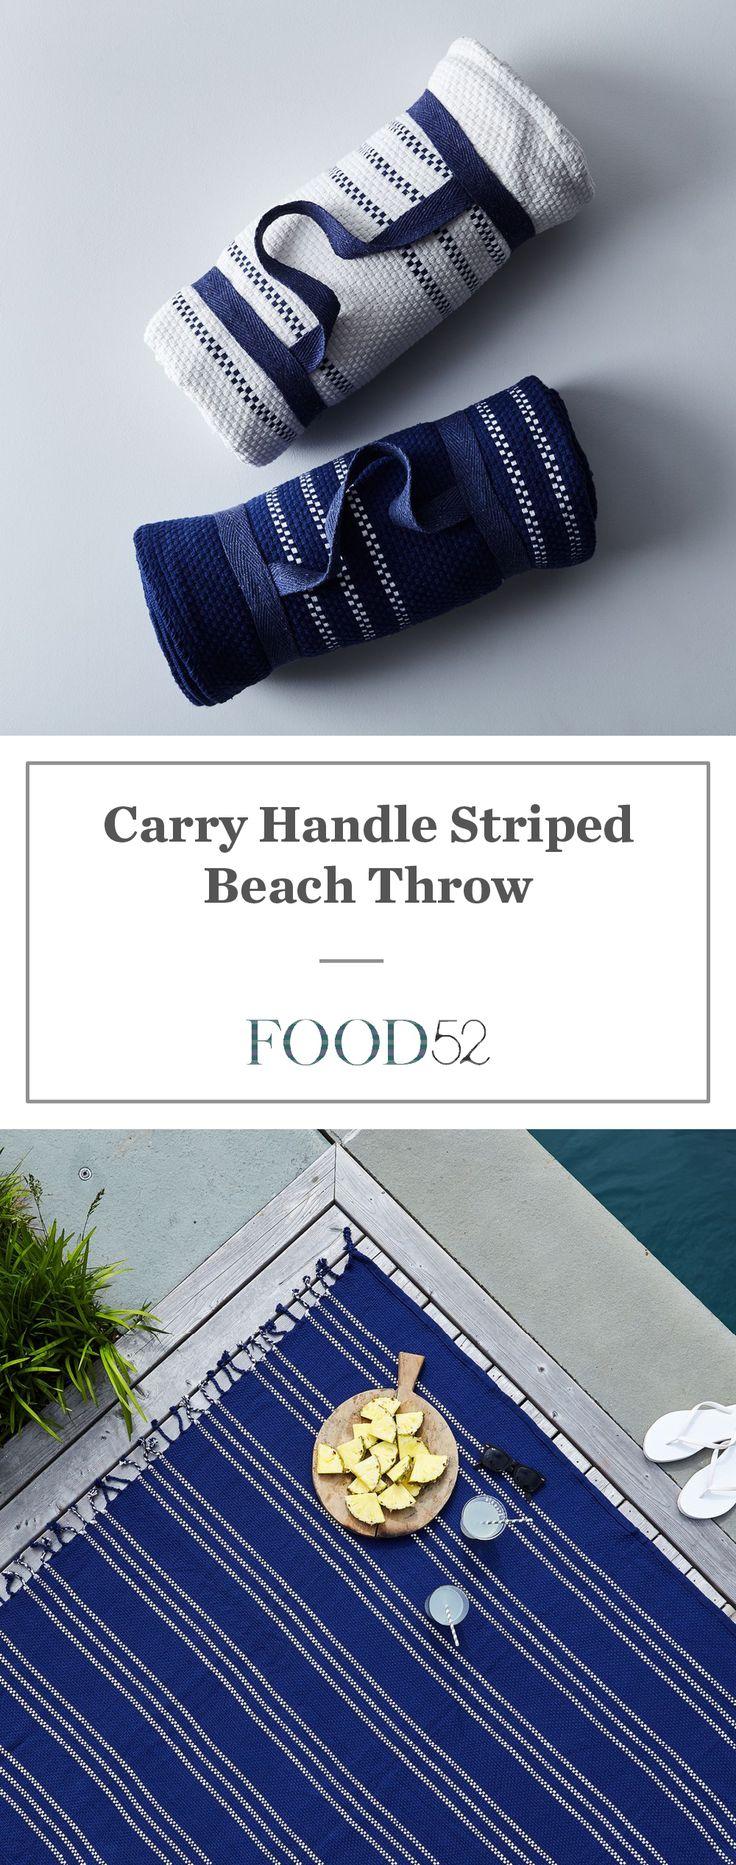 Carry Handle Striped Beach Throw